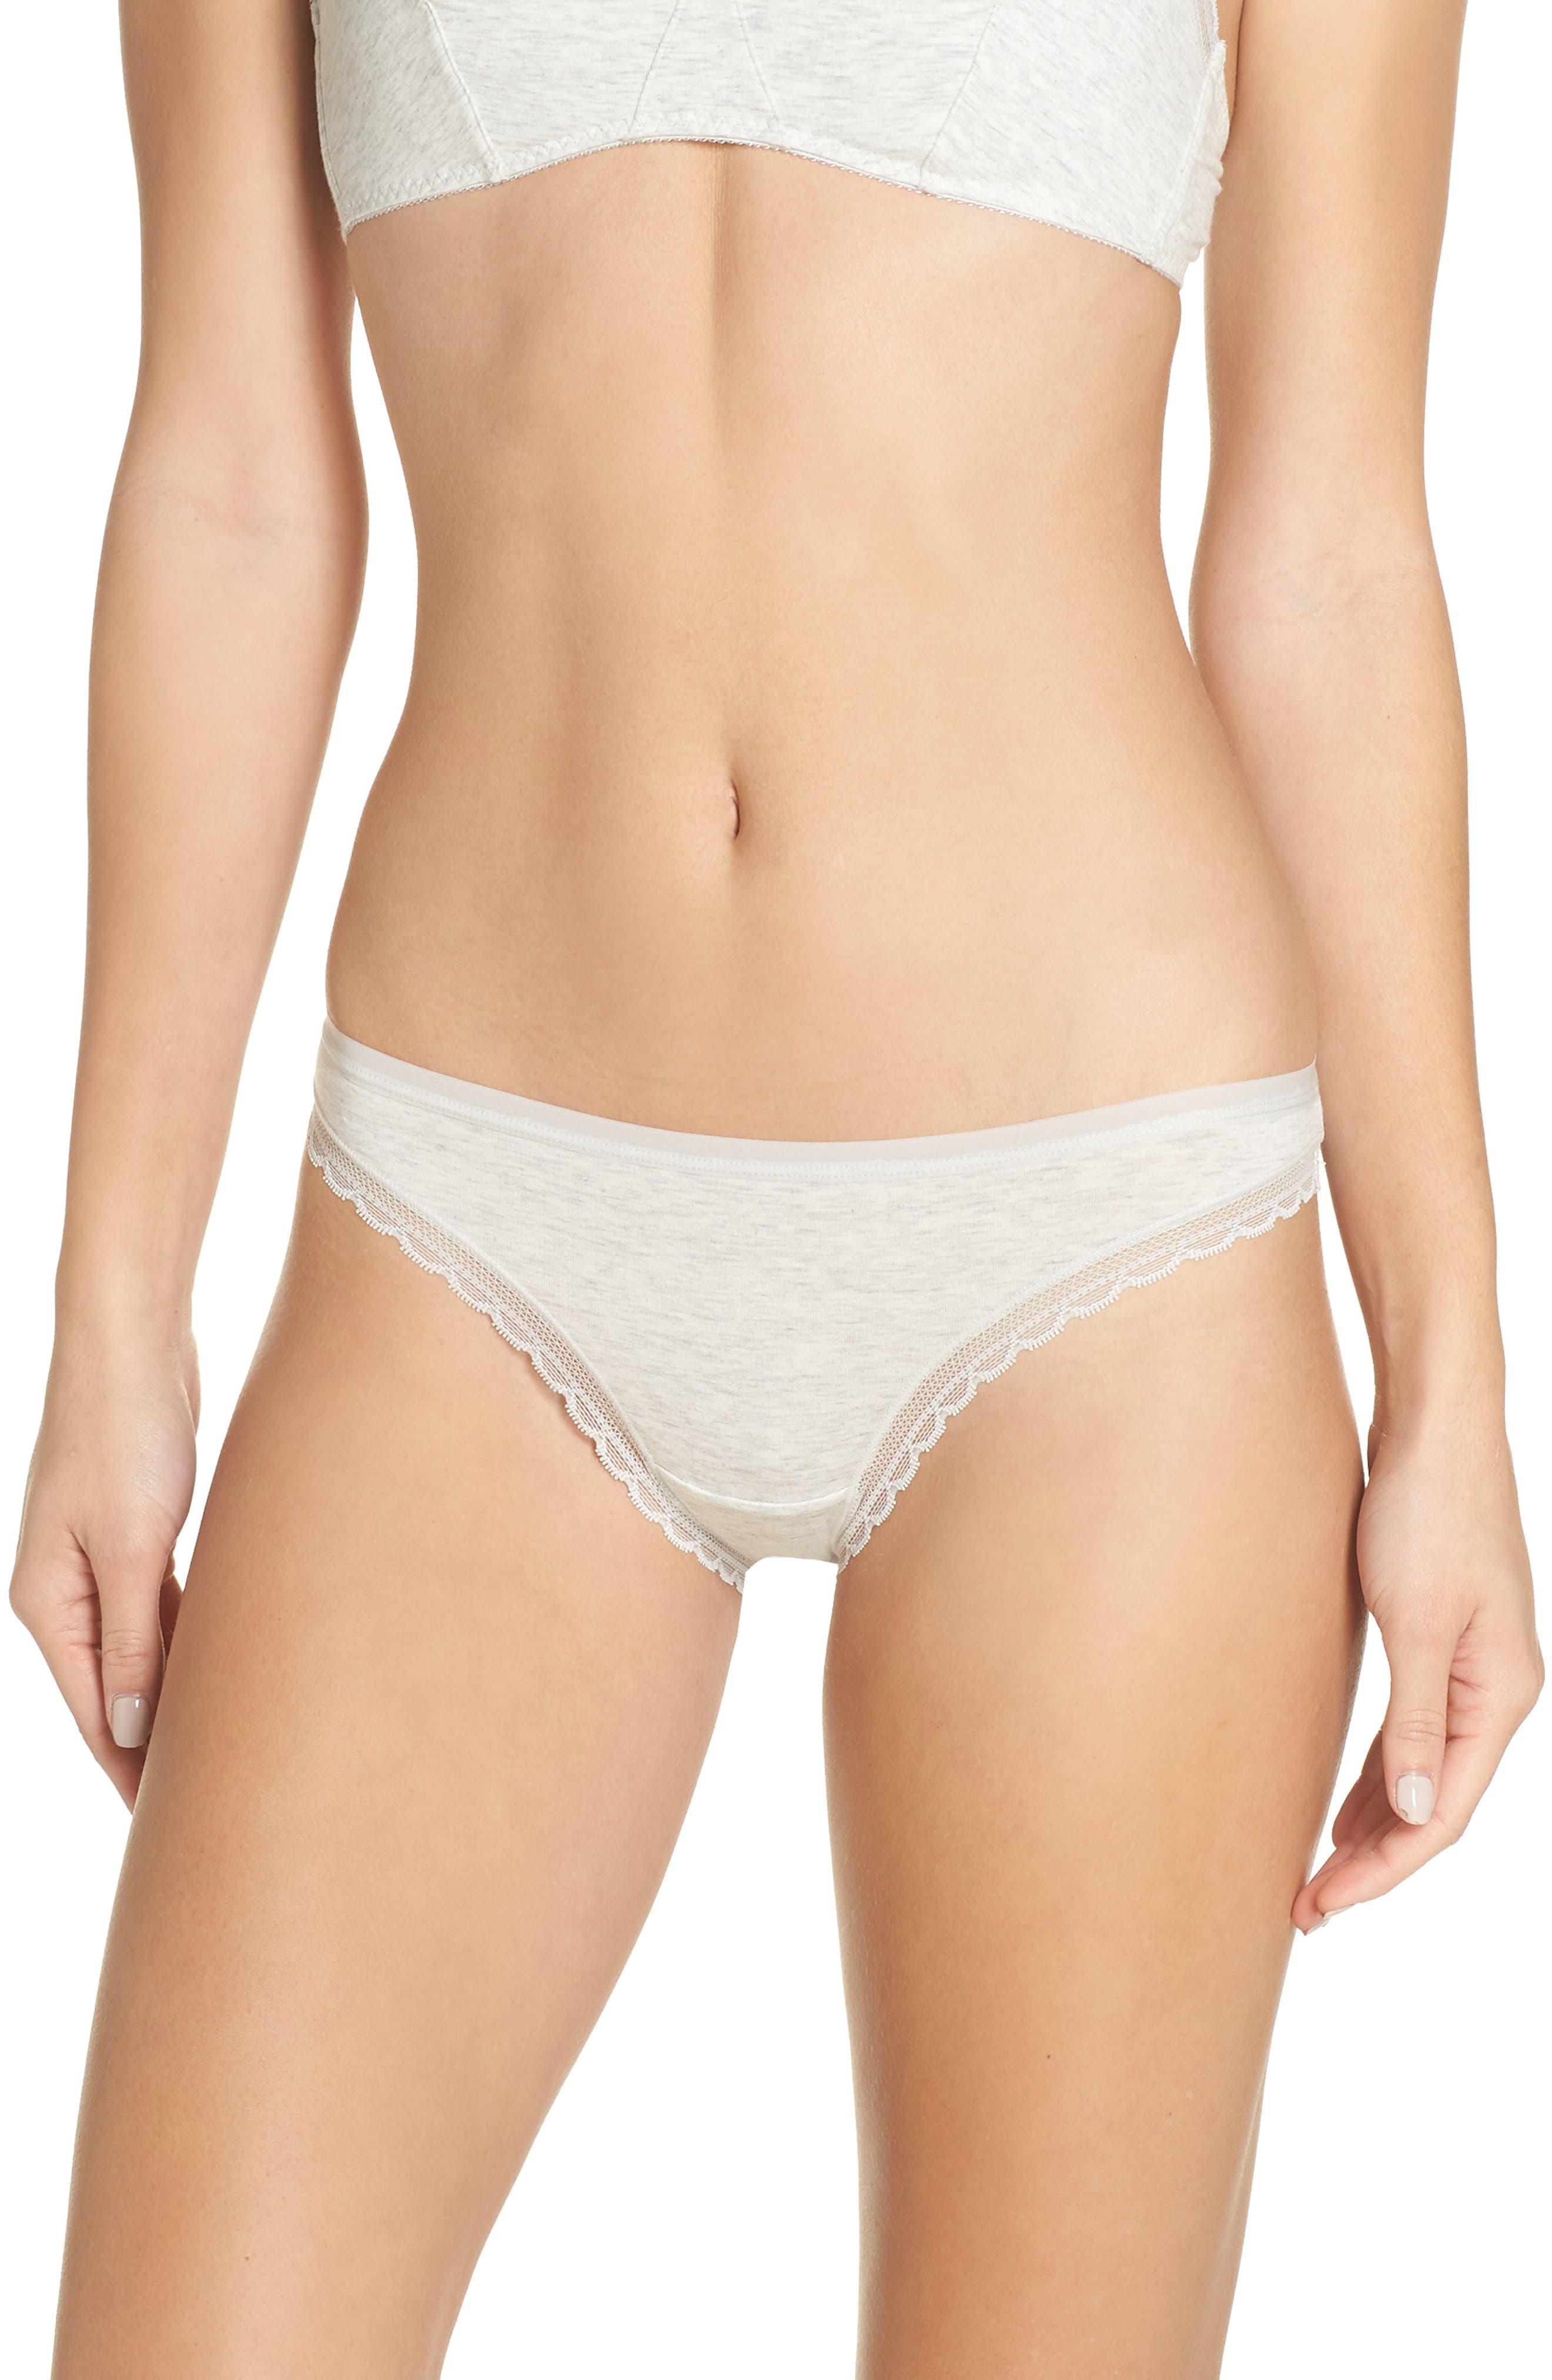 ONGOSSAMER Cabana Cotton Blend Bikini in Heather Grey